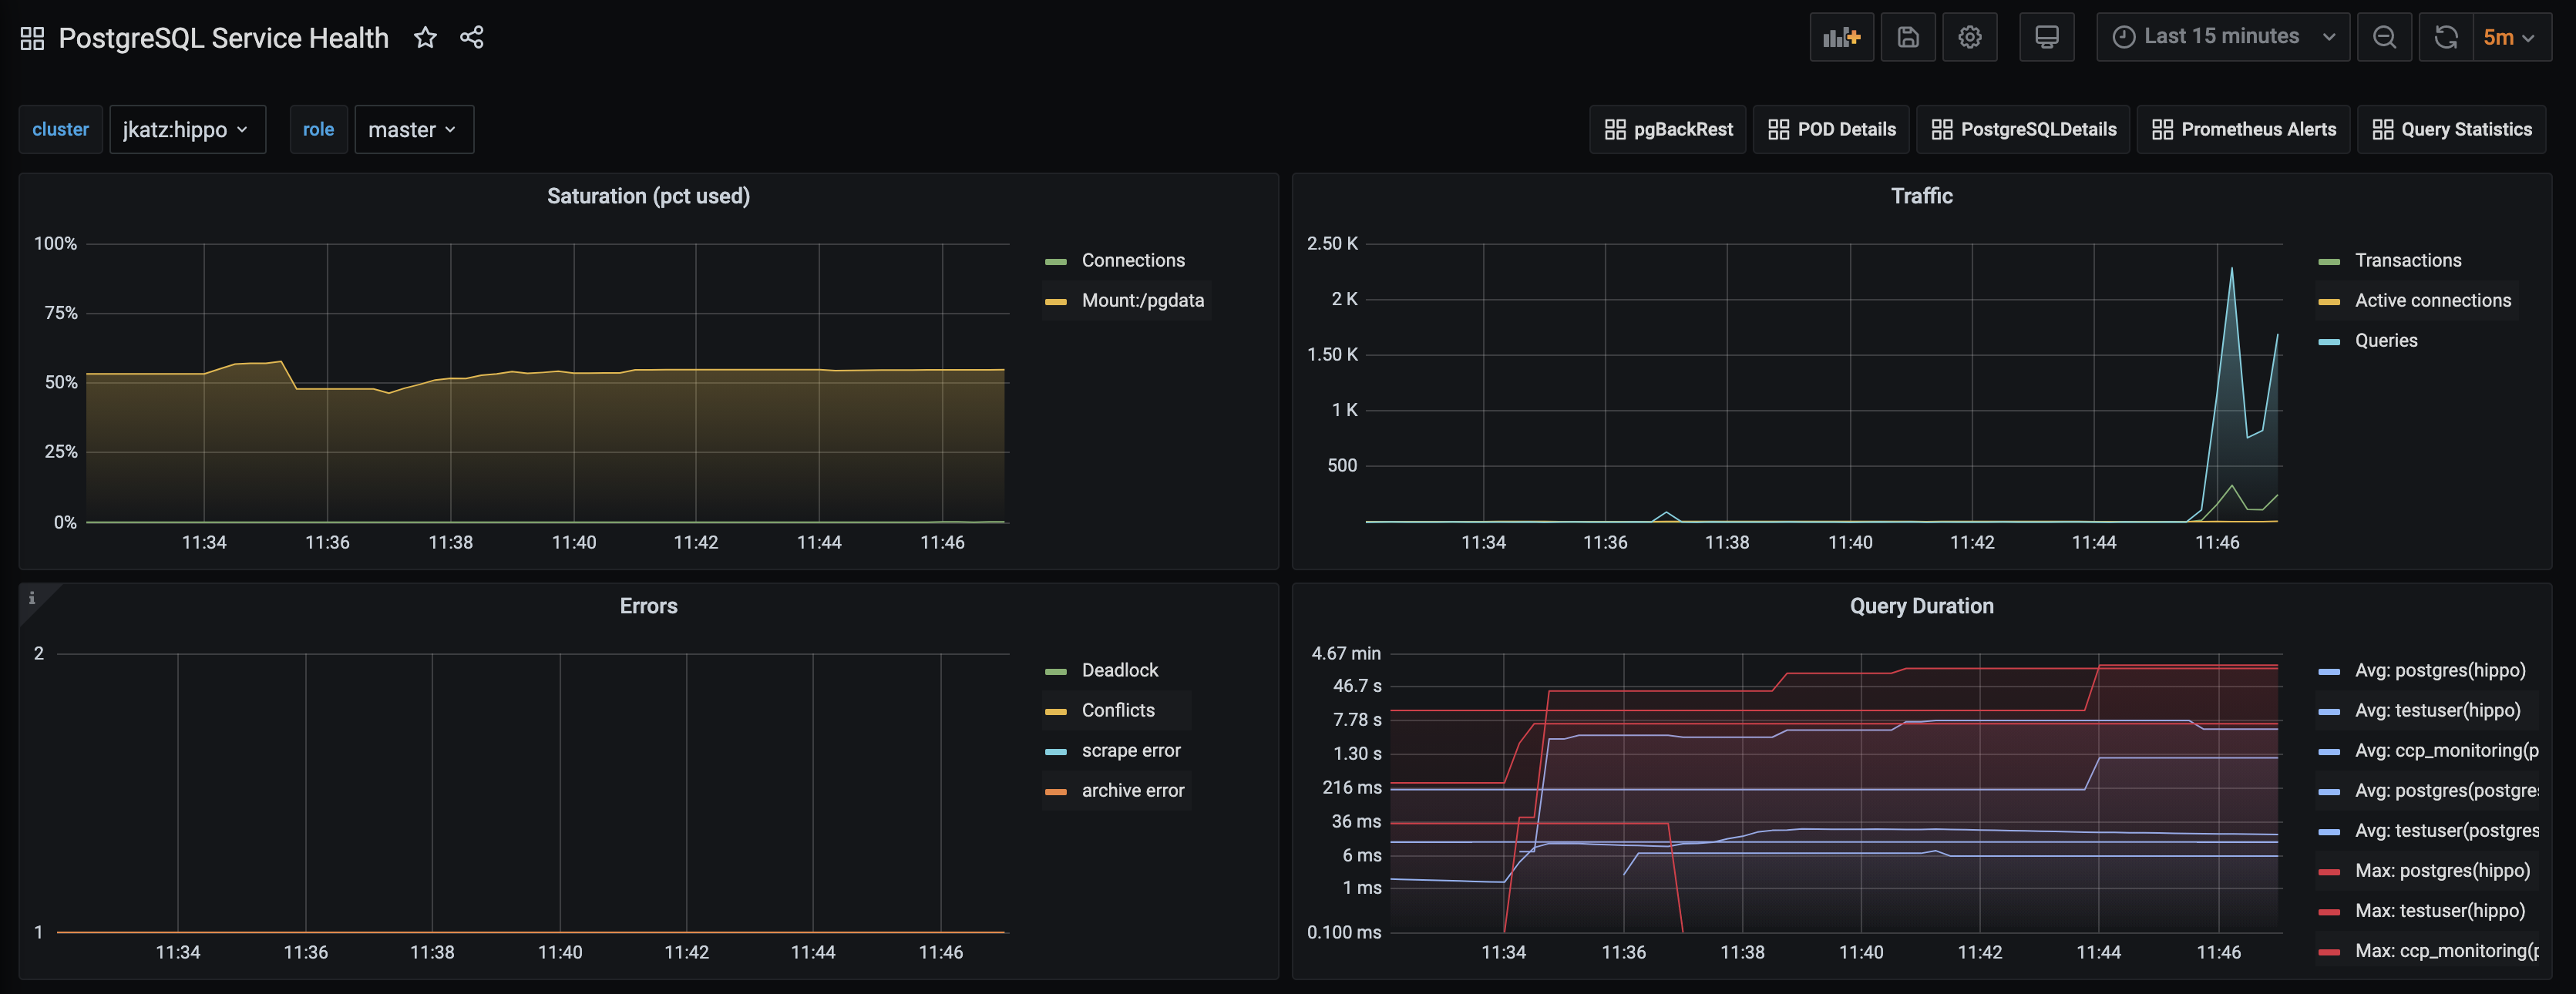 PostgreSQL Operator Monitoring - Service Health Overview